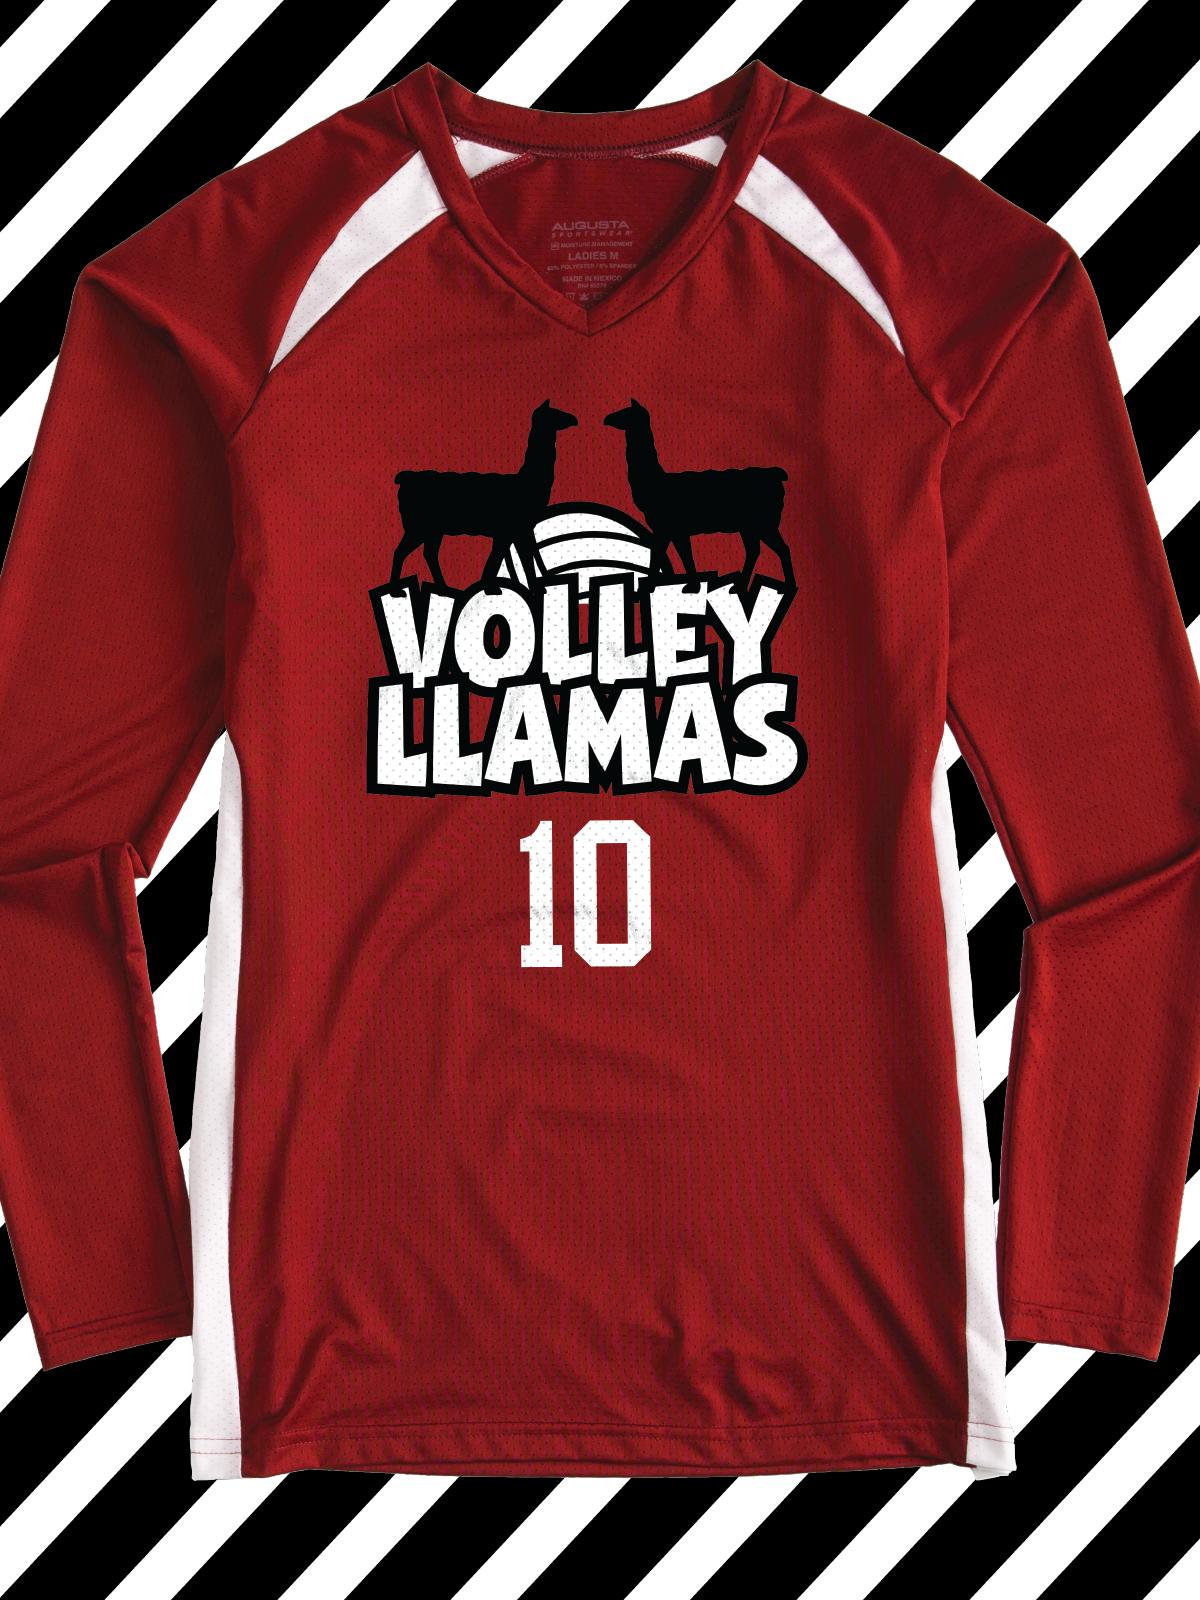 T shirt design volleyball - Volley Llamas Funny Design Idea For Custom Volleyball Jerseys Team Shirts League Shirts